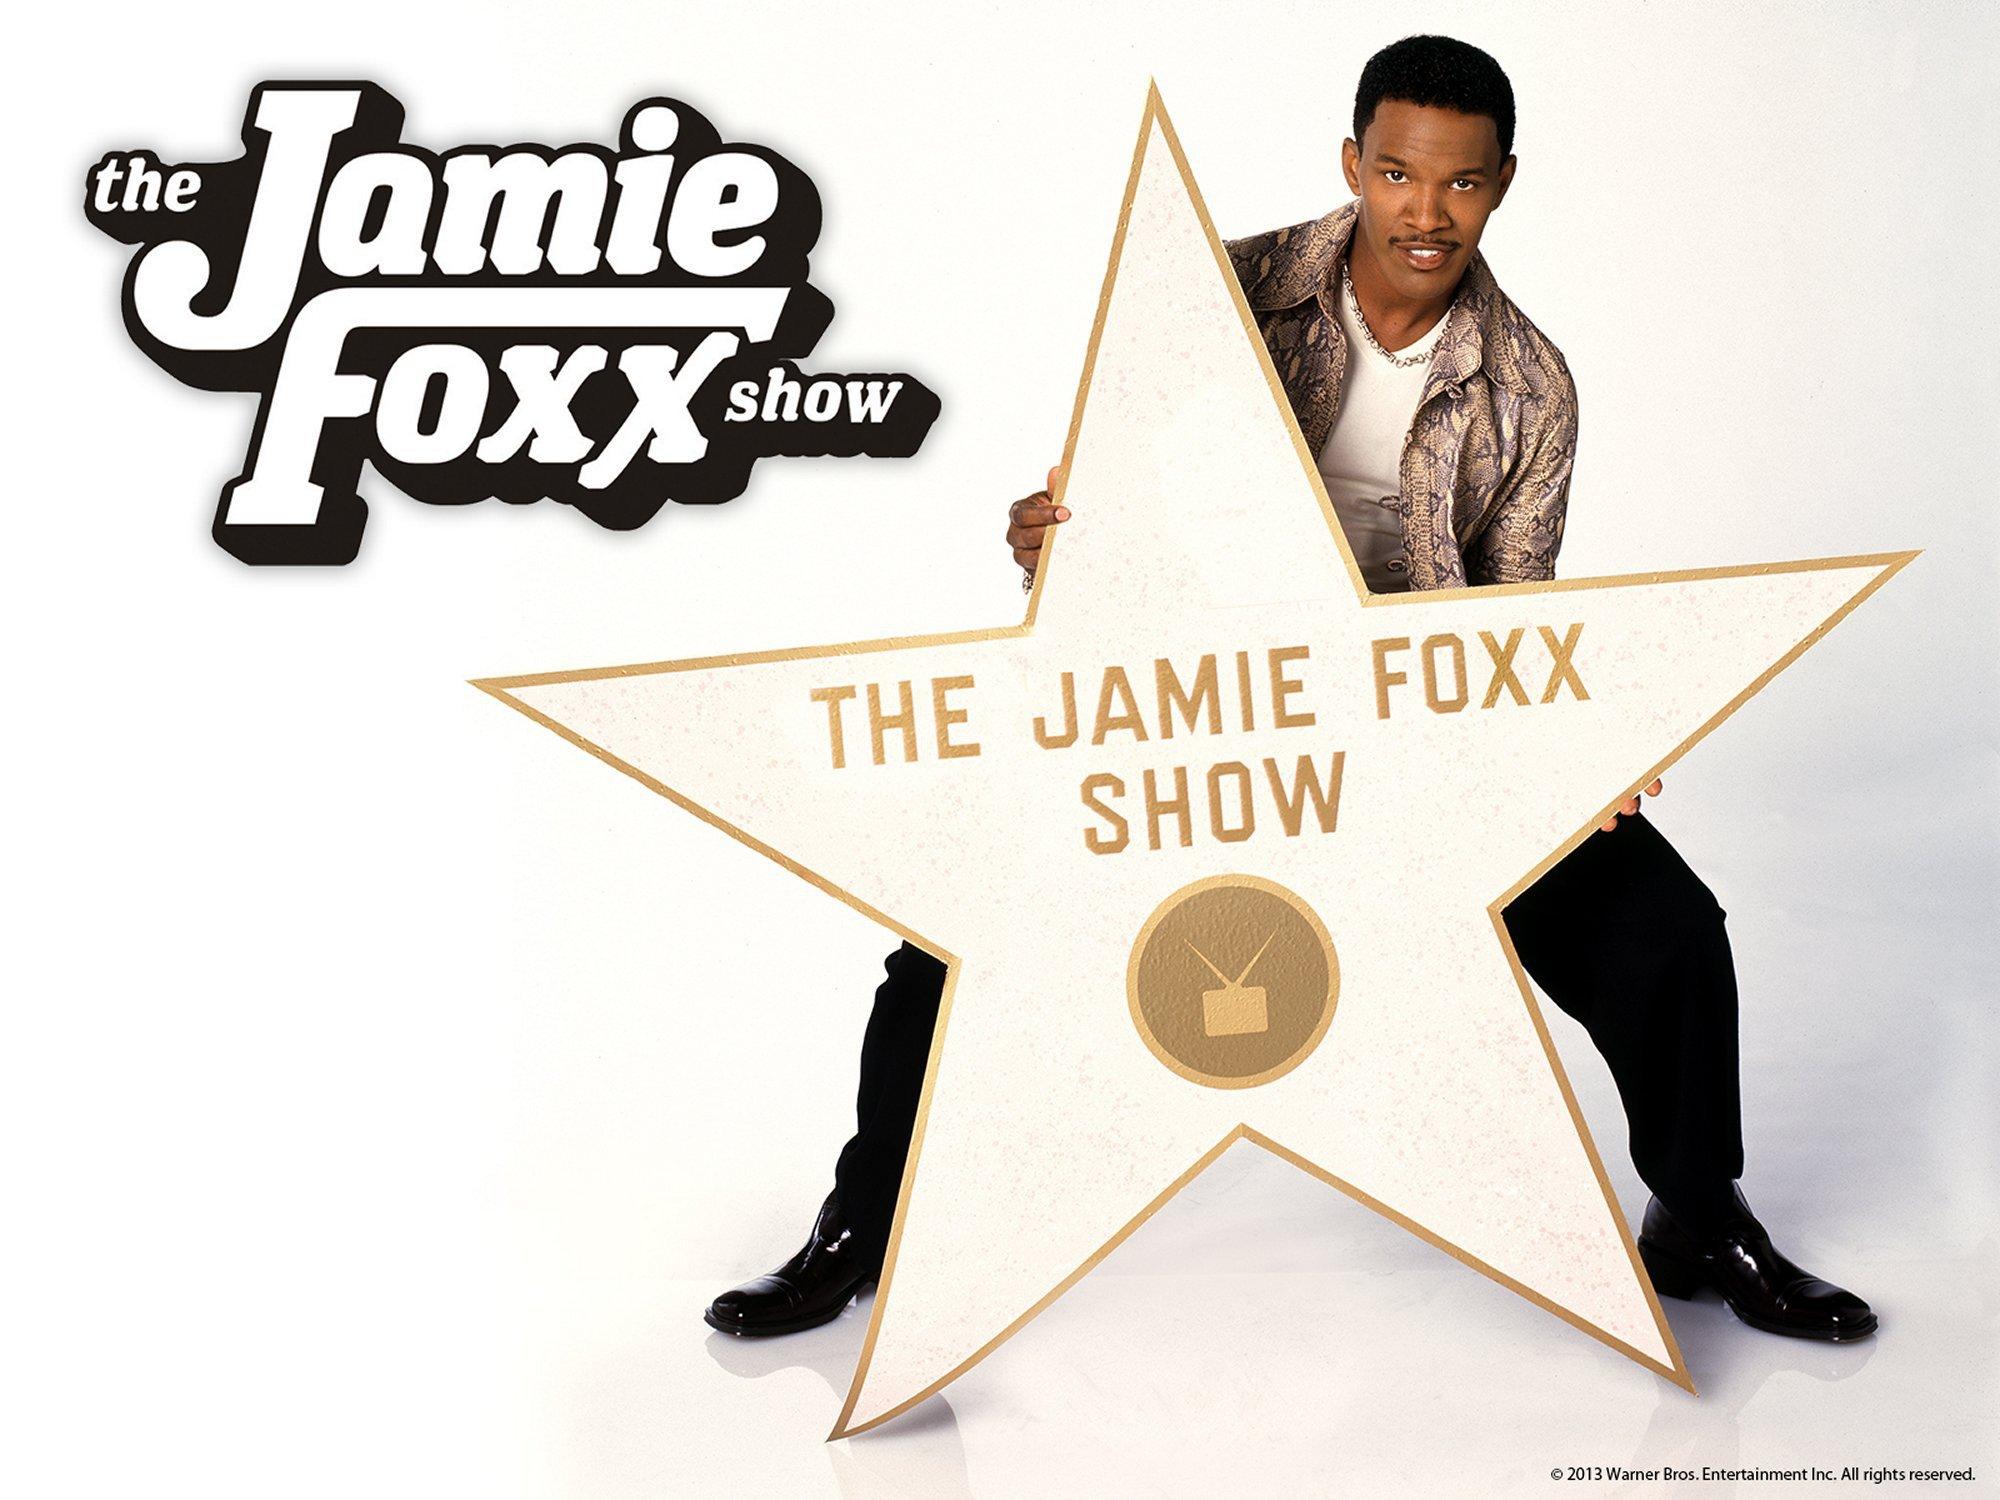 the jamie foxx show free download